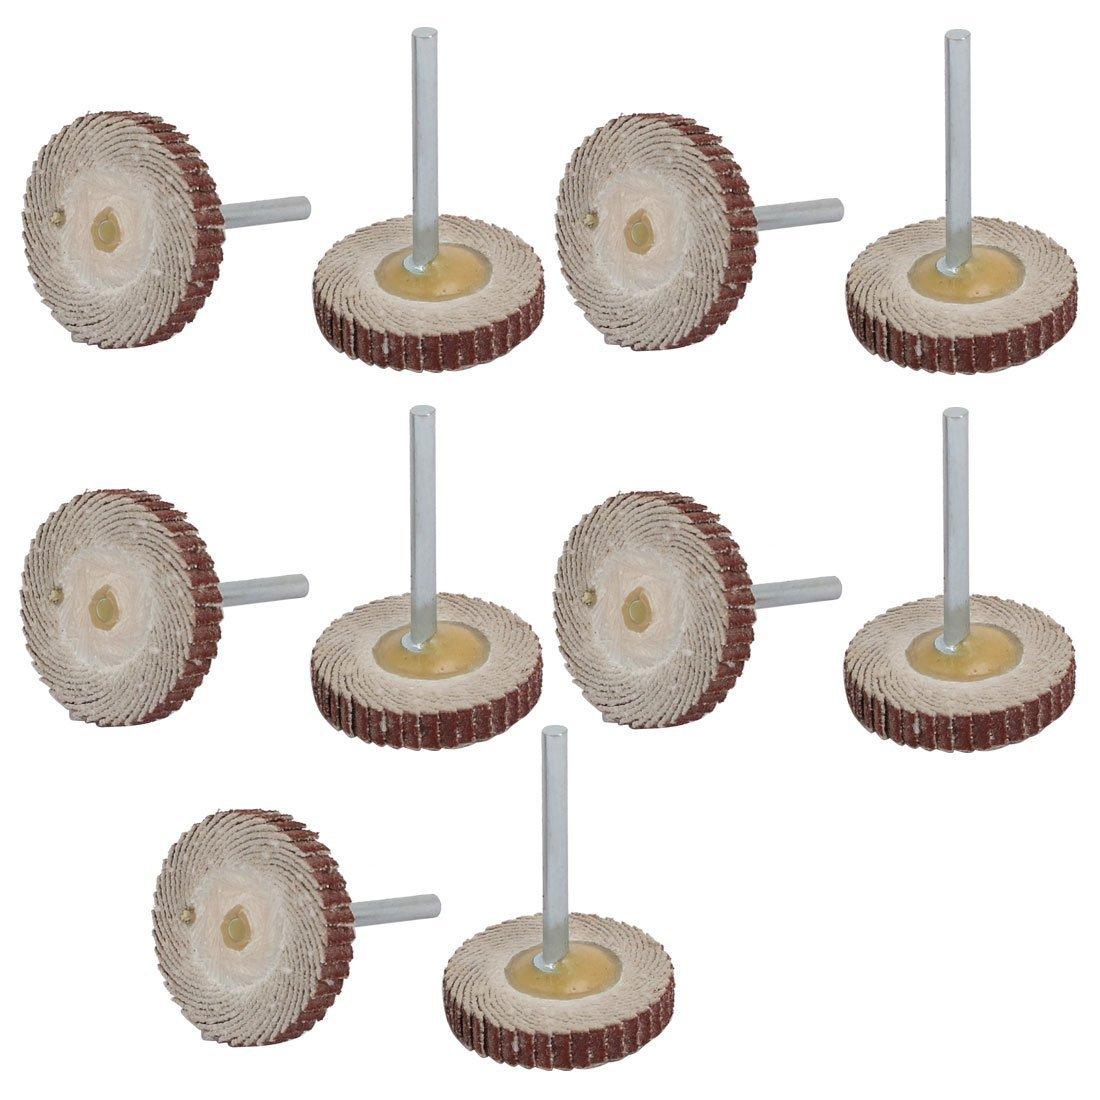 Portal Cool 120 Grit 25mm Dia T Type Flap Sanding Wheel Grinding Polishing Tool 10pcs